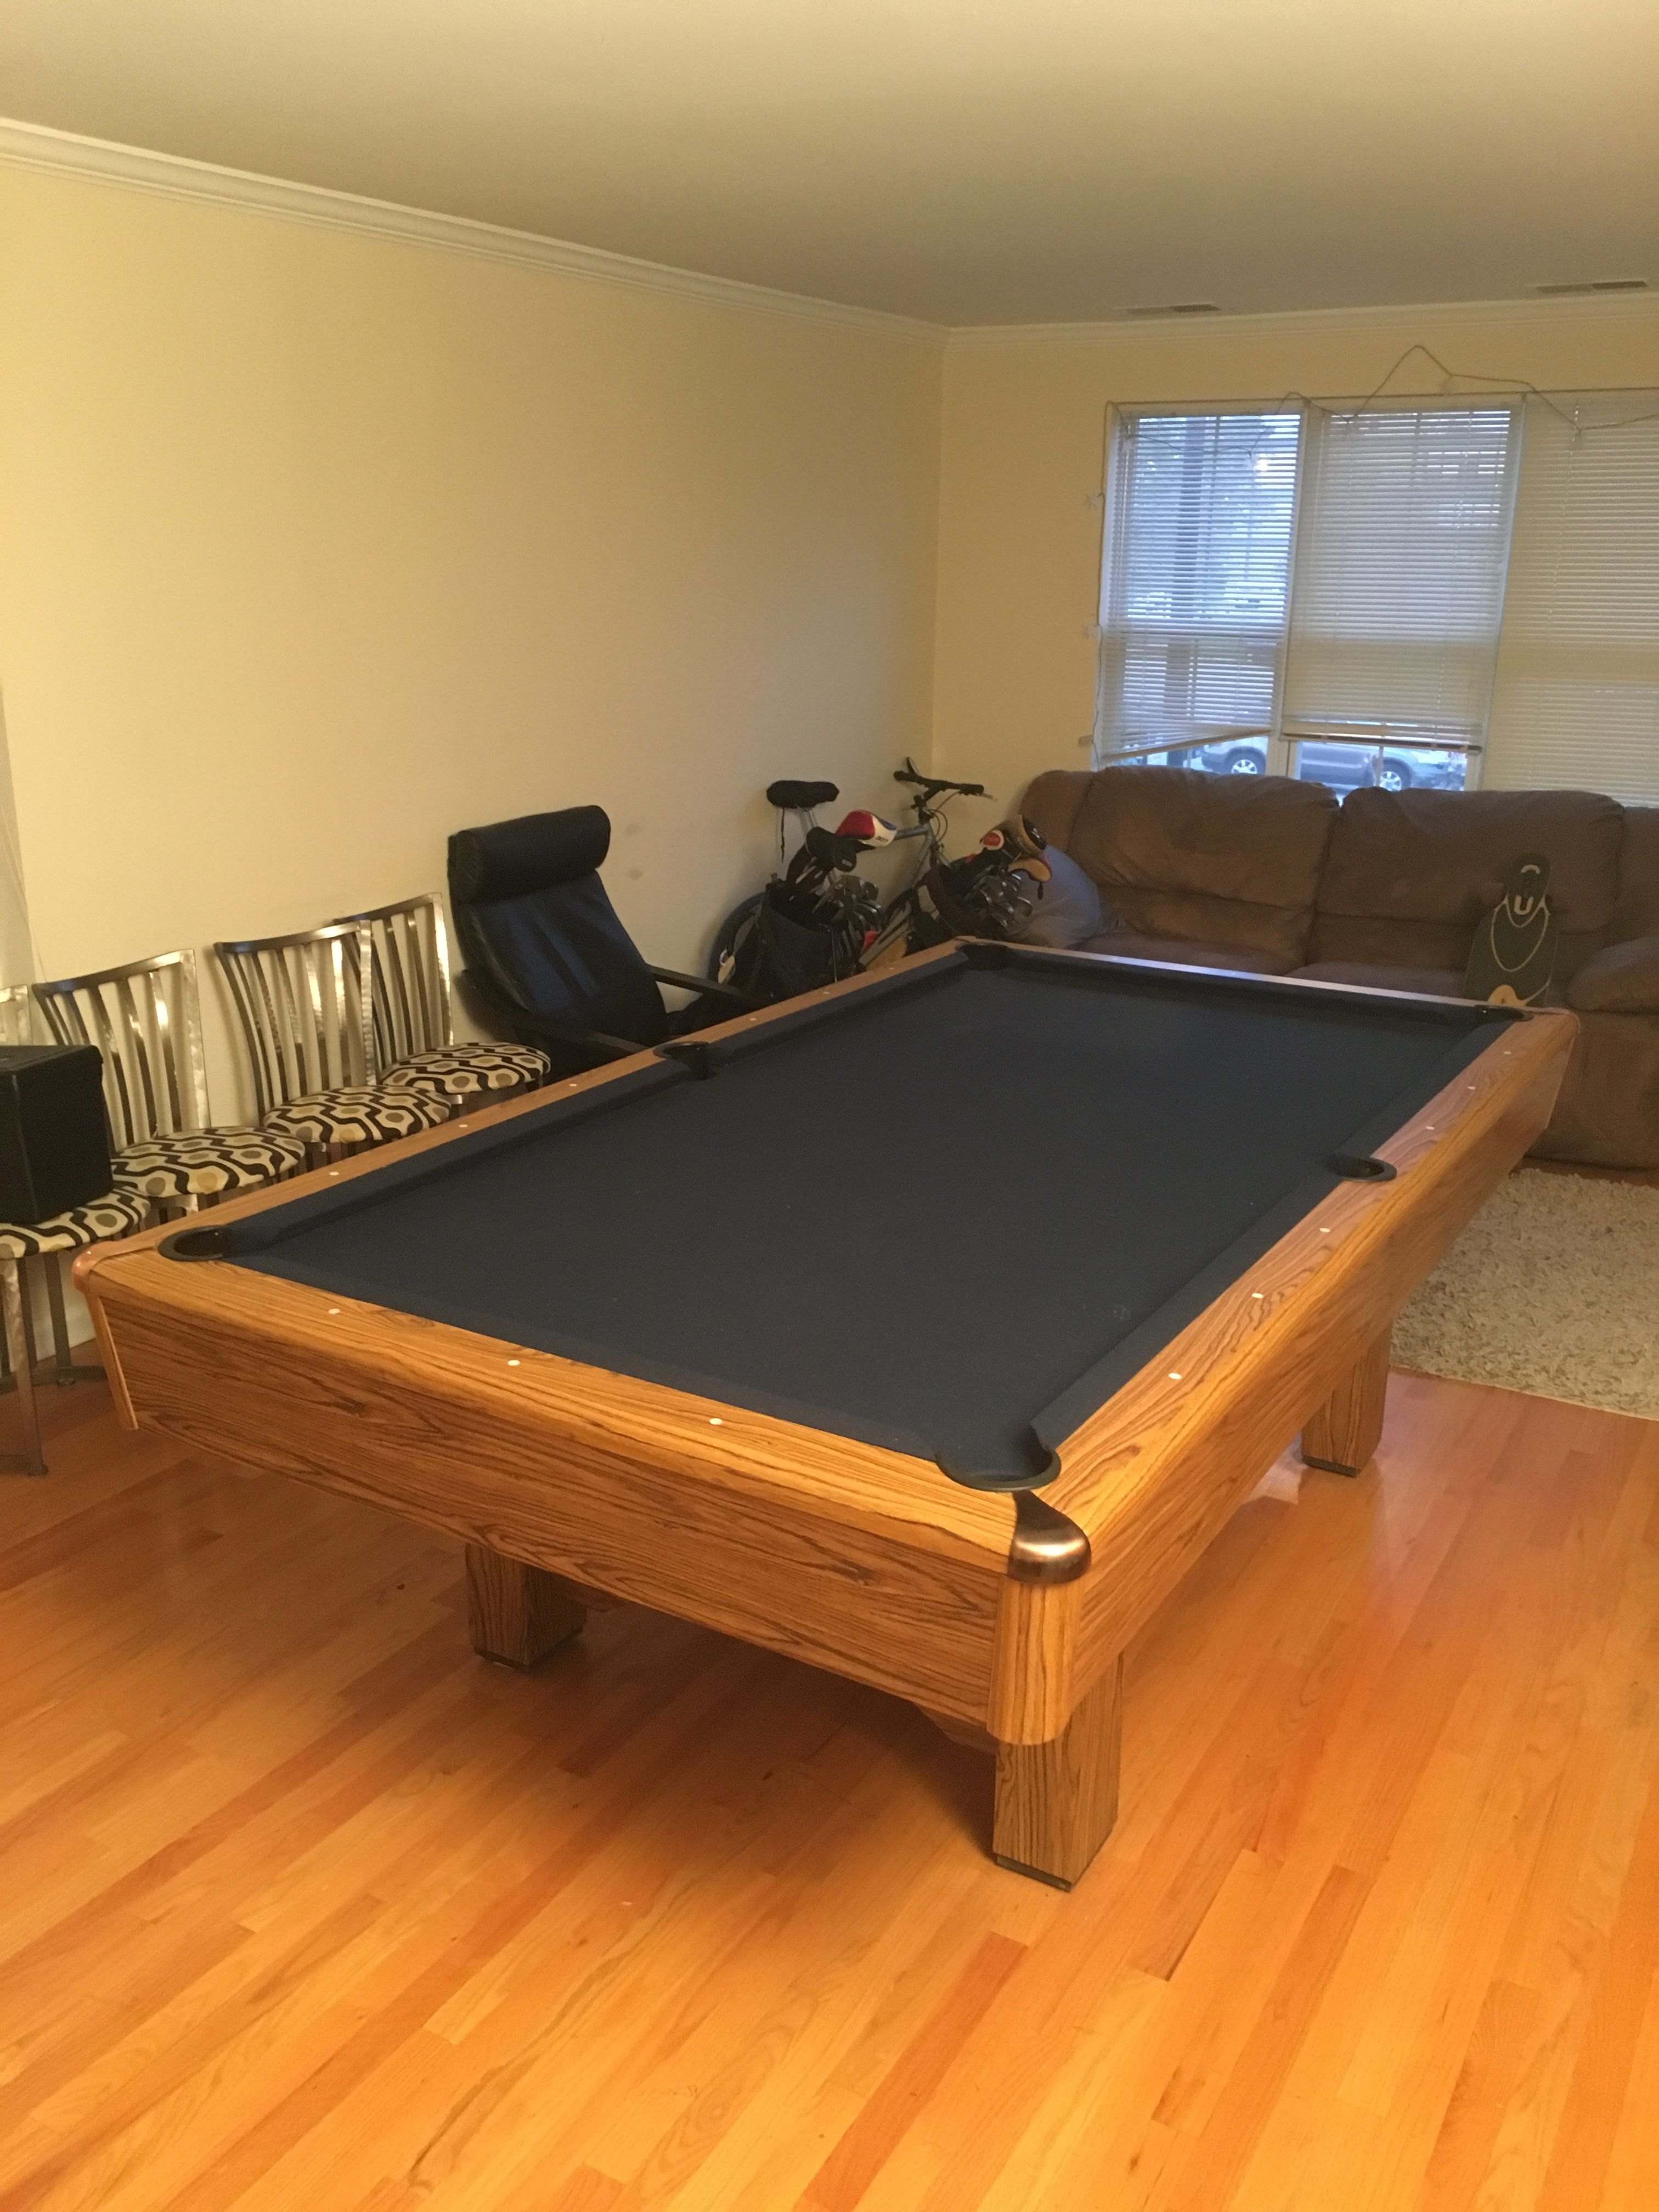 how to sell uaed billard table